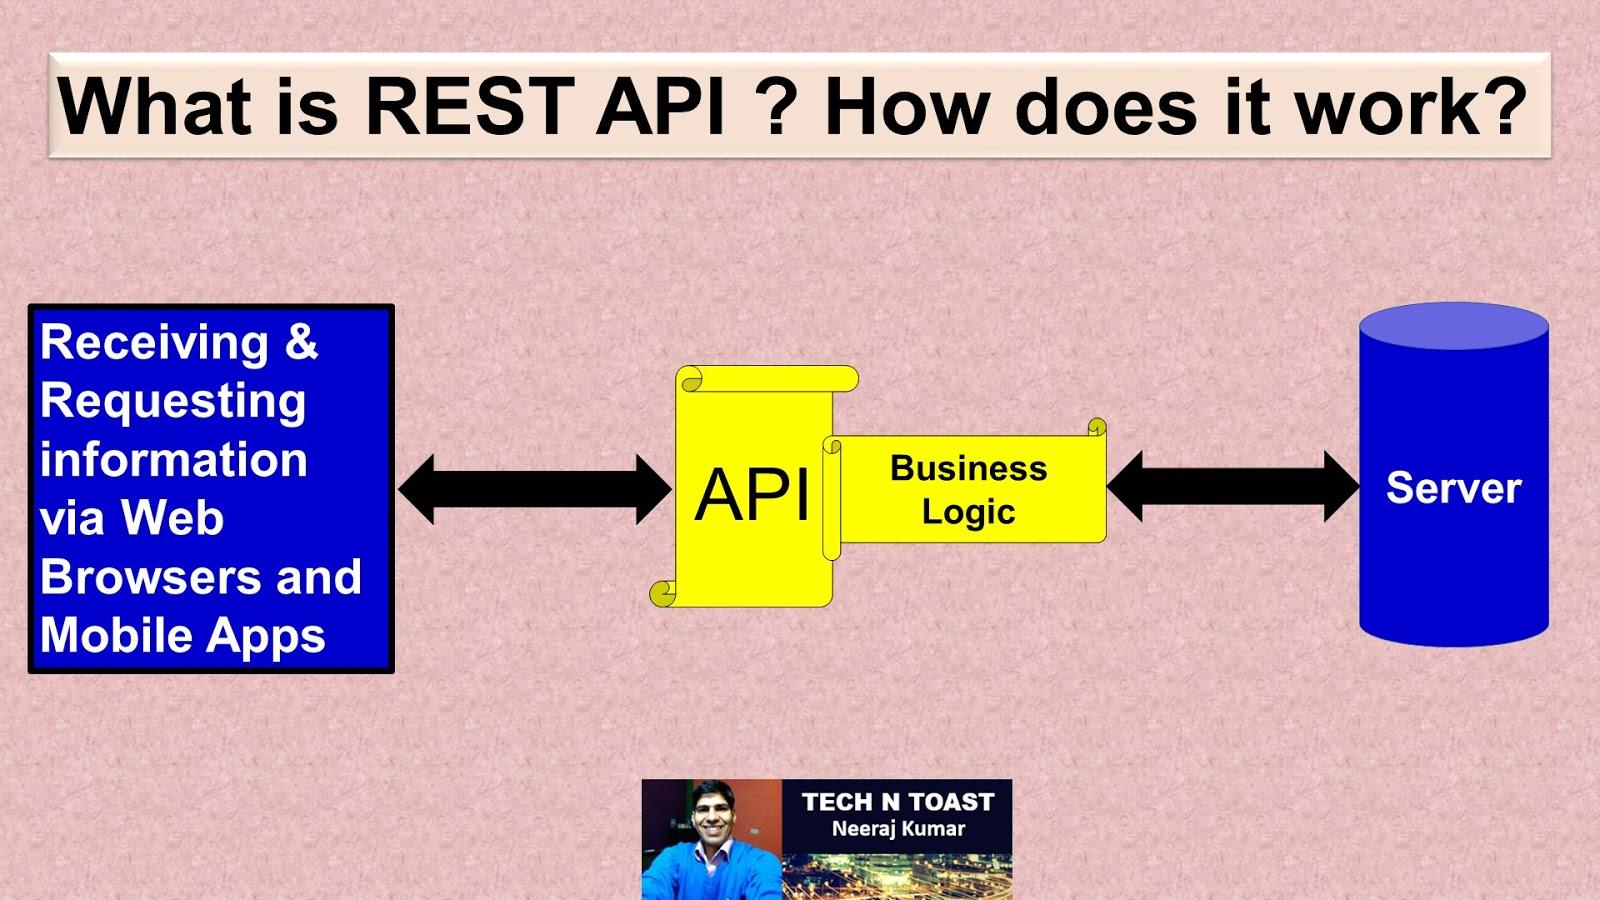 REST API - representational state transfer application programming interface